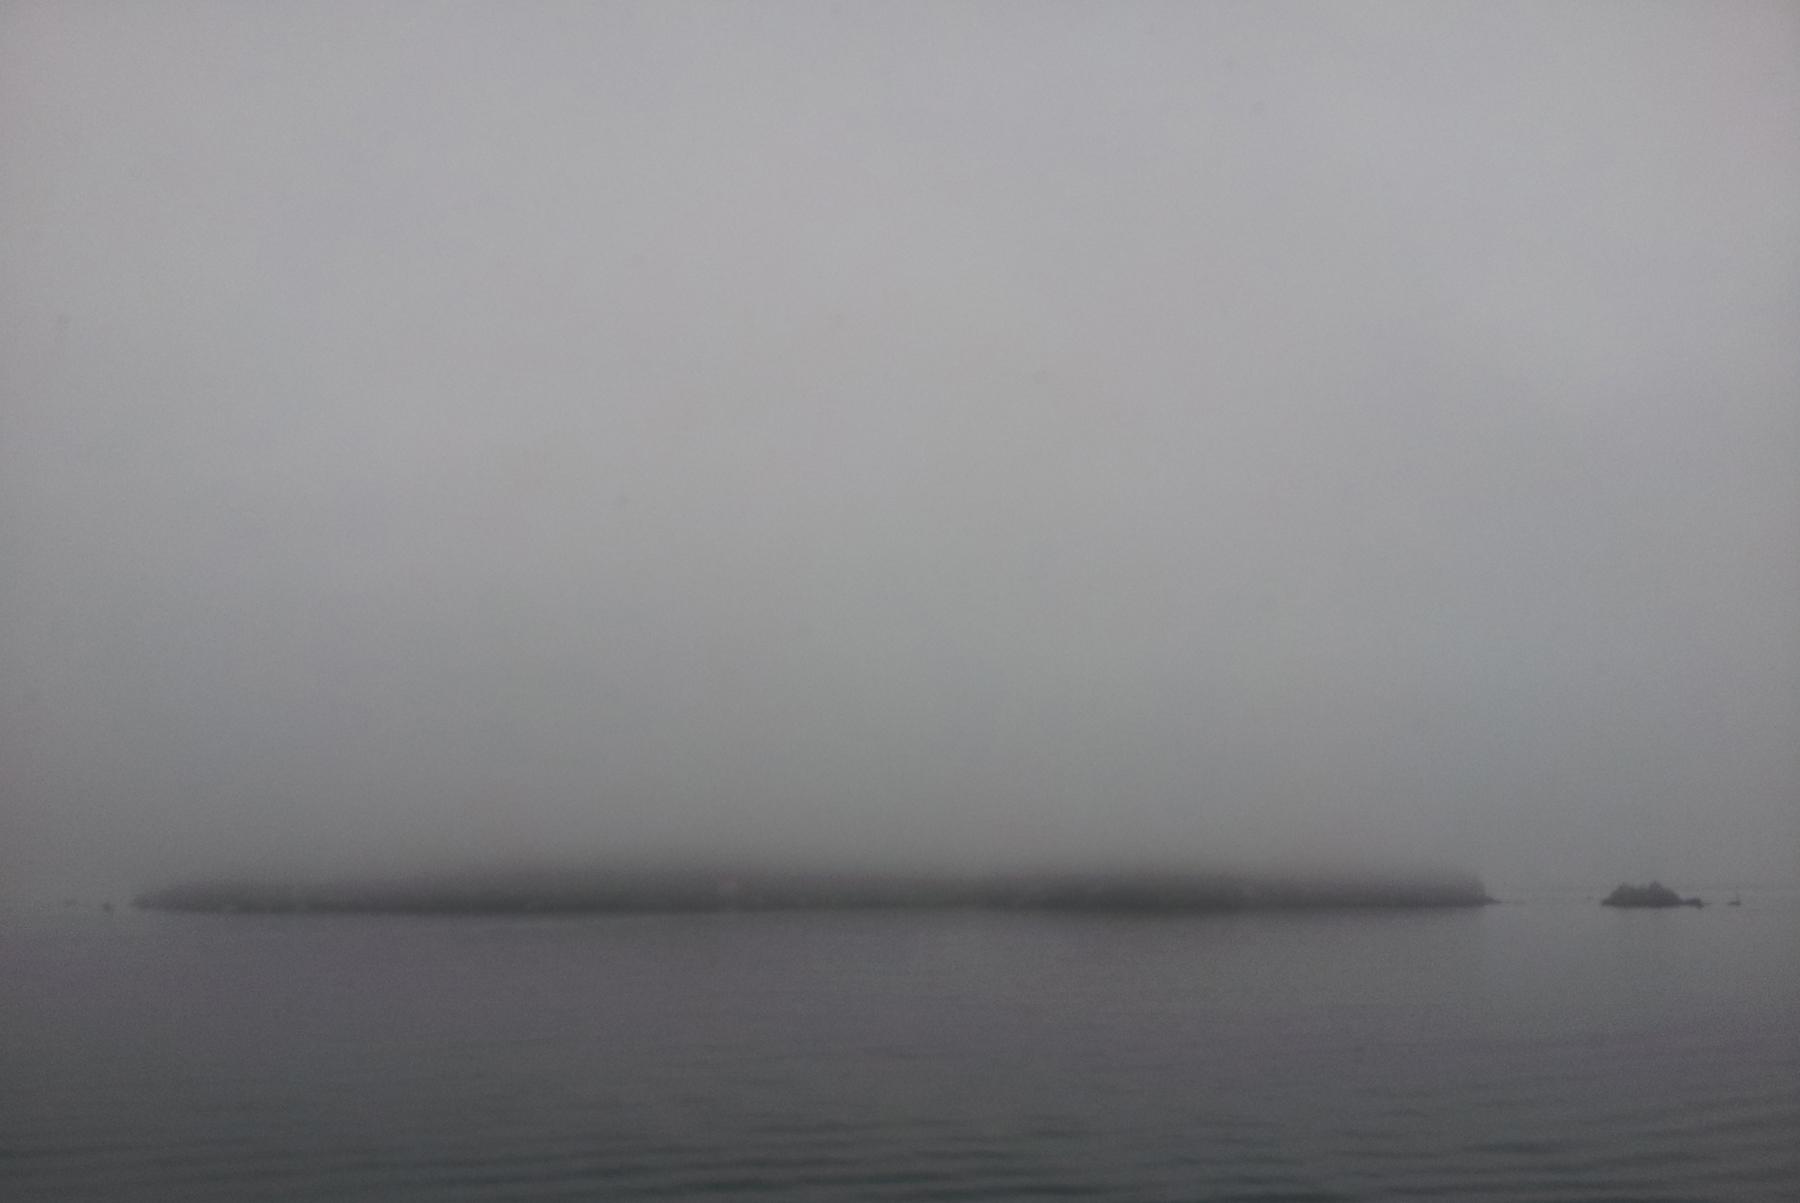 Northern Passage, B.C Canada